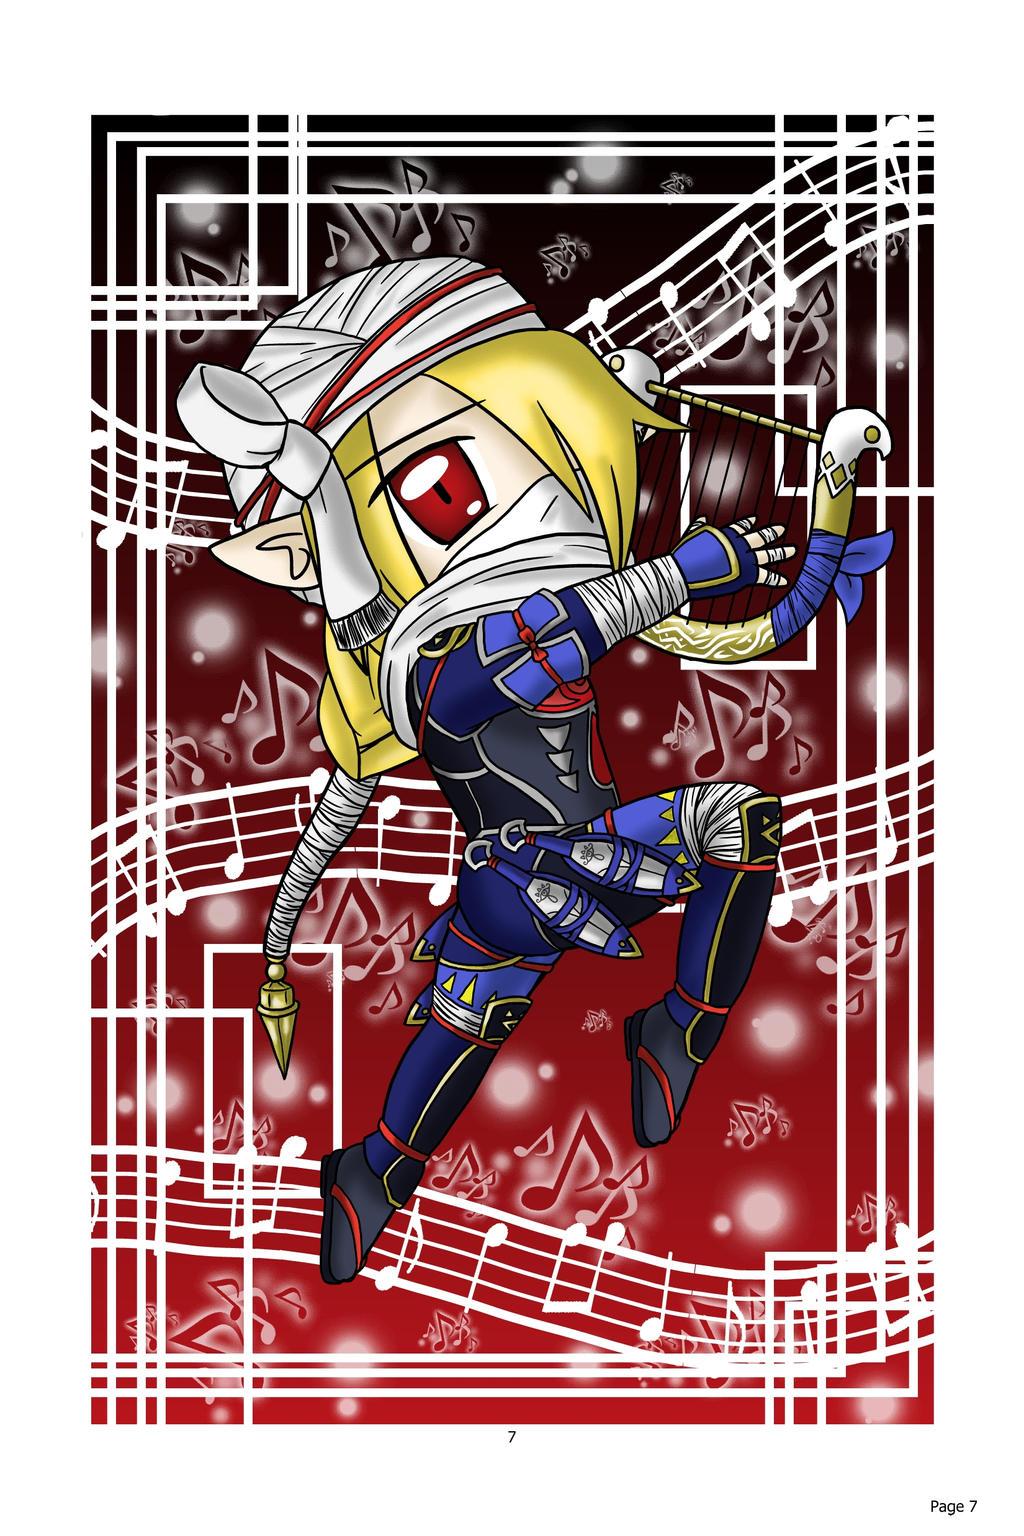 Chibi Shiek: Hyrule Warrior by lillilotus